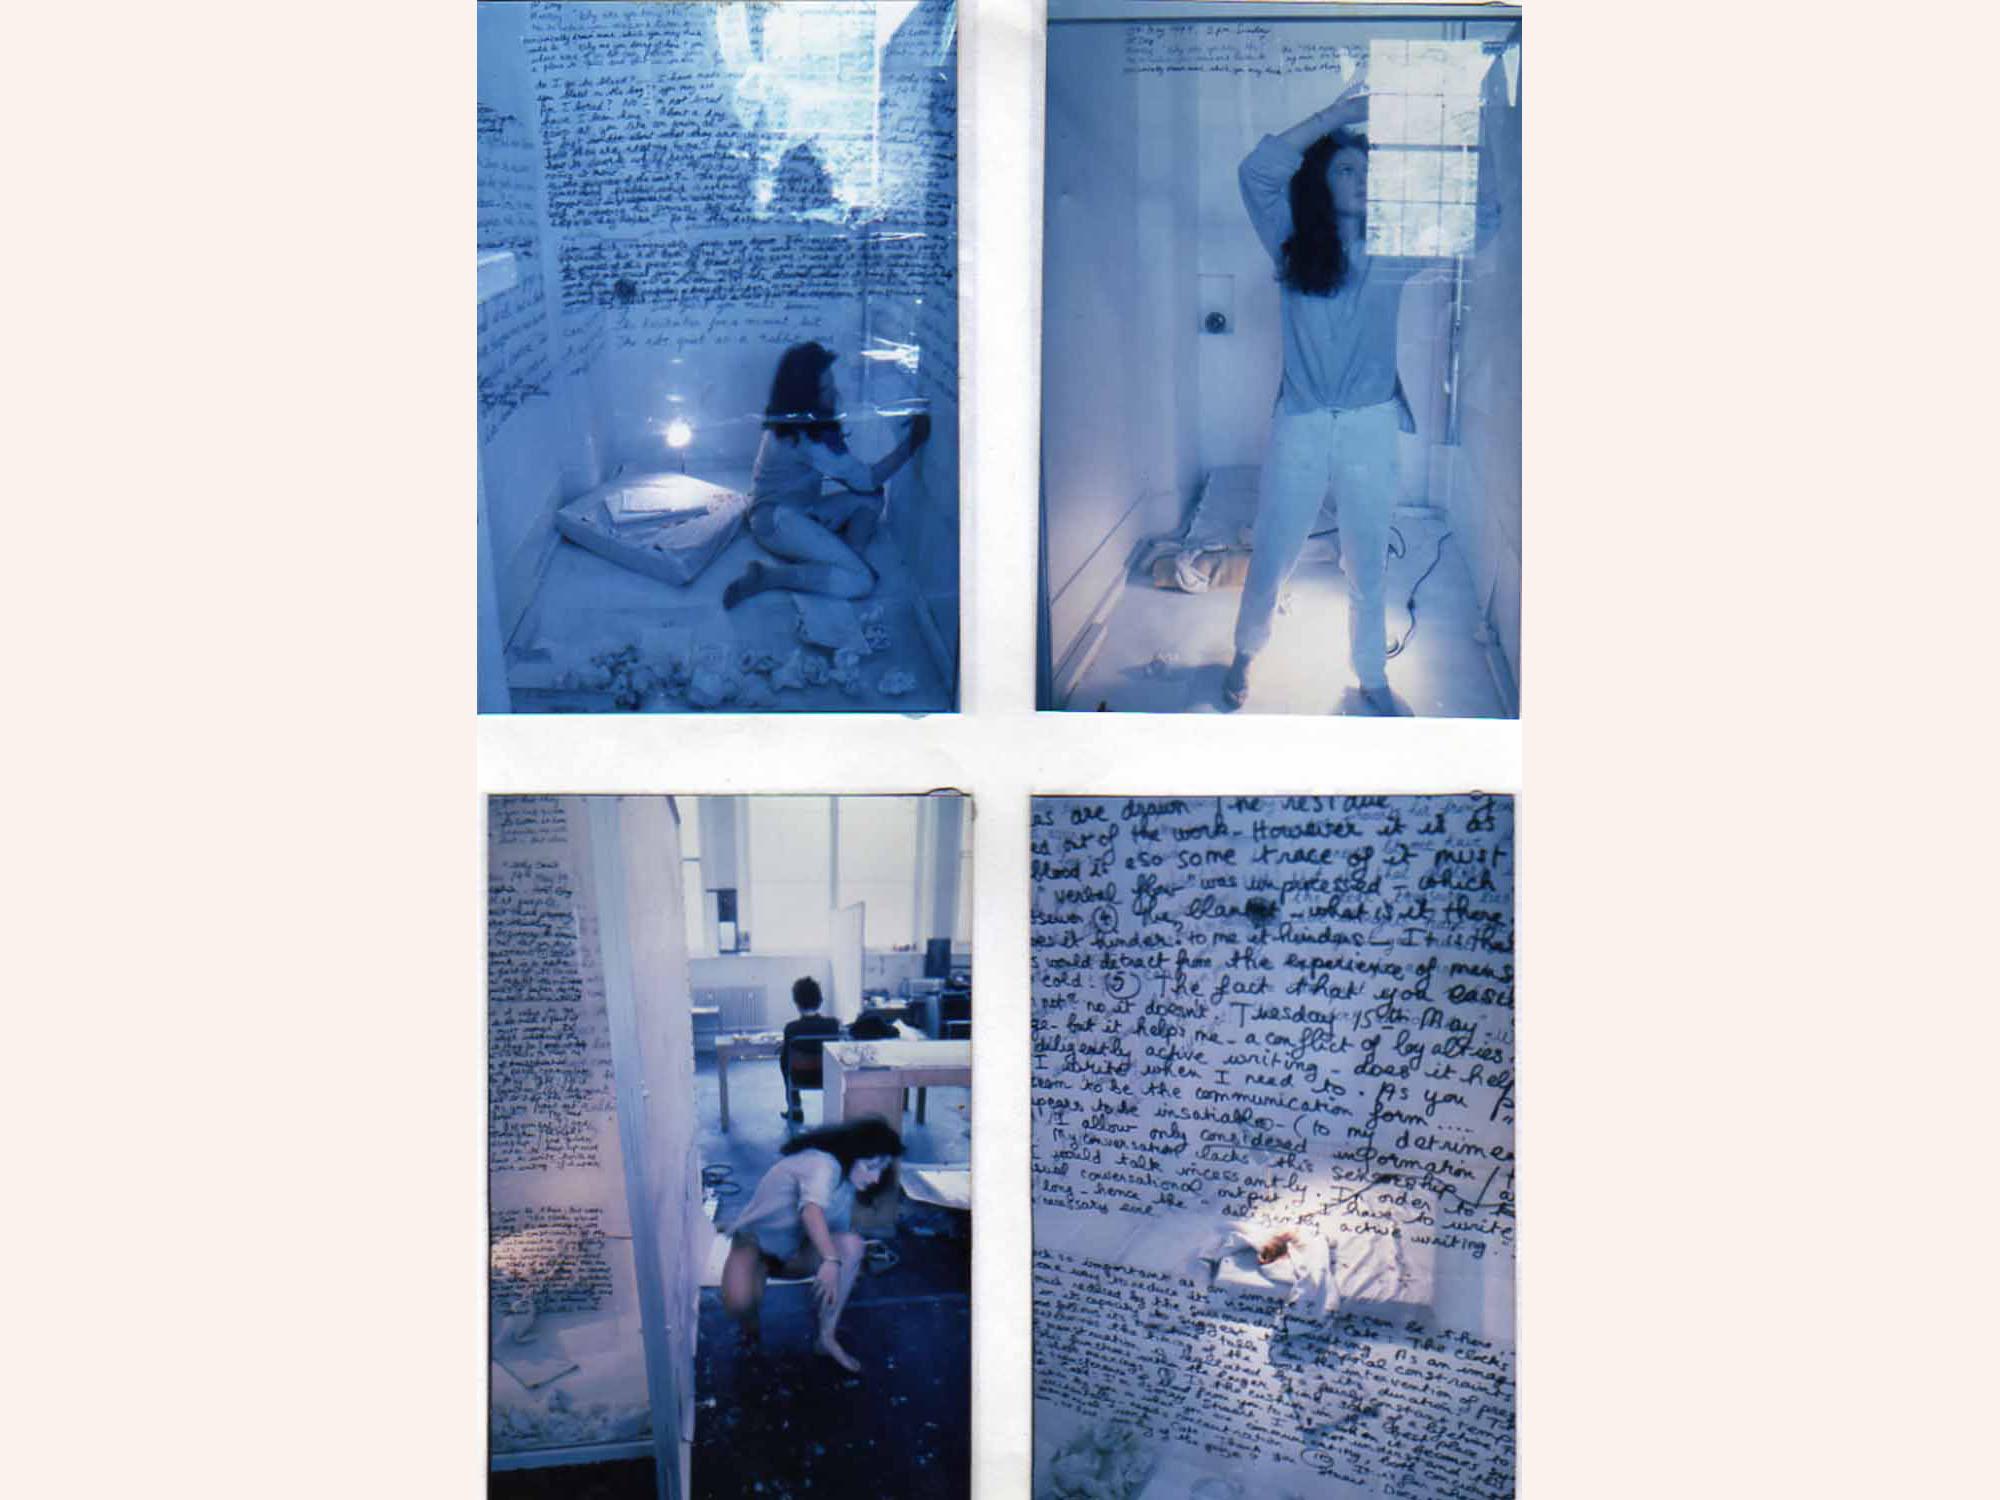 Catherine Elwes, Menstruation 1, 1979, Slade School of Art, London. Photo by John Muellbauer, Jean Matthee, Mandy Havers or Iain Robertson. Copyright Catherine Elwes